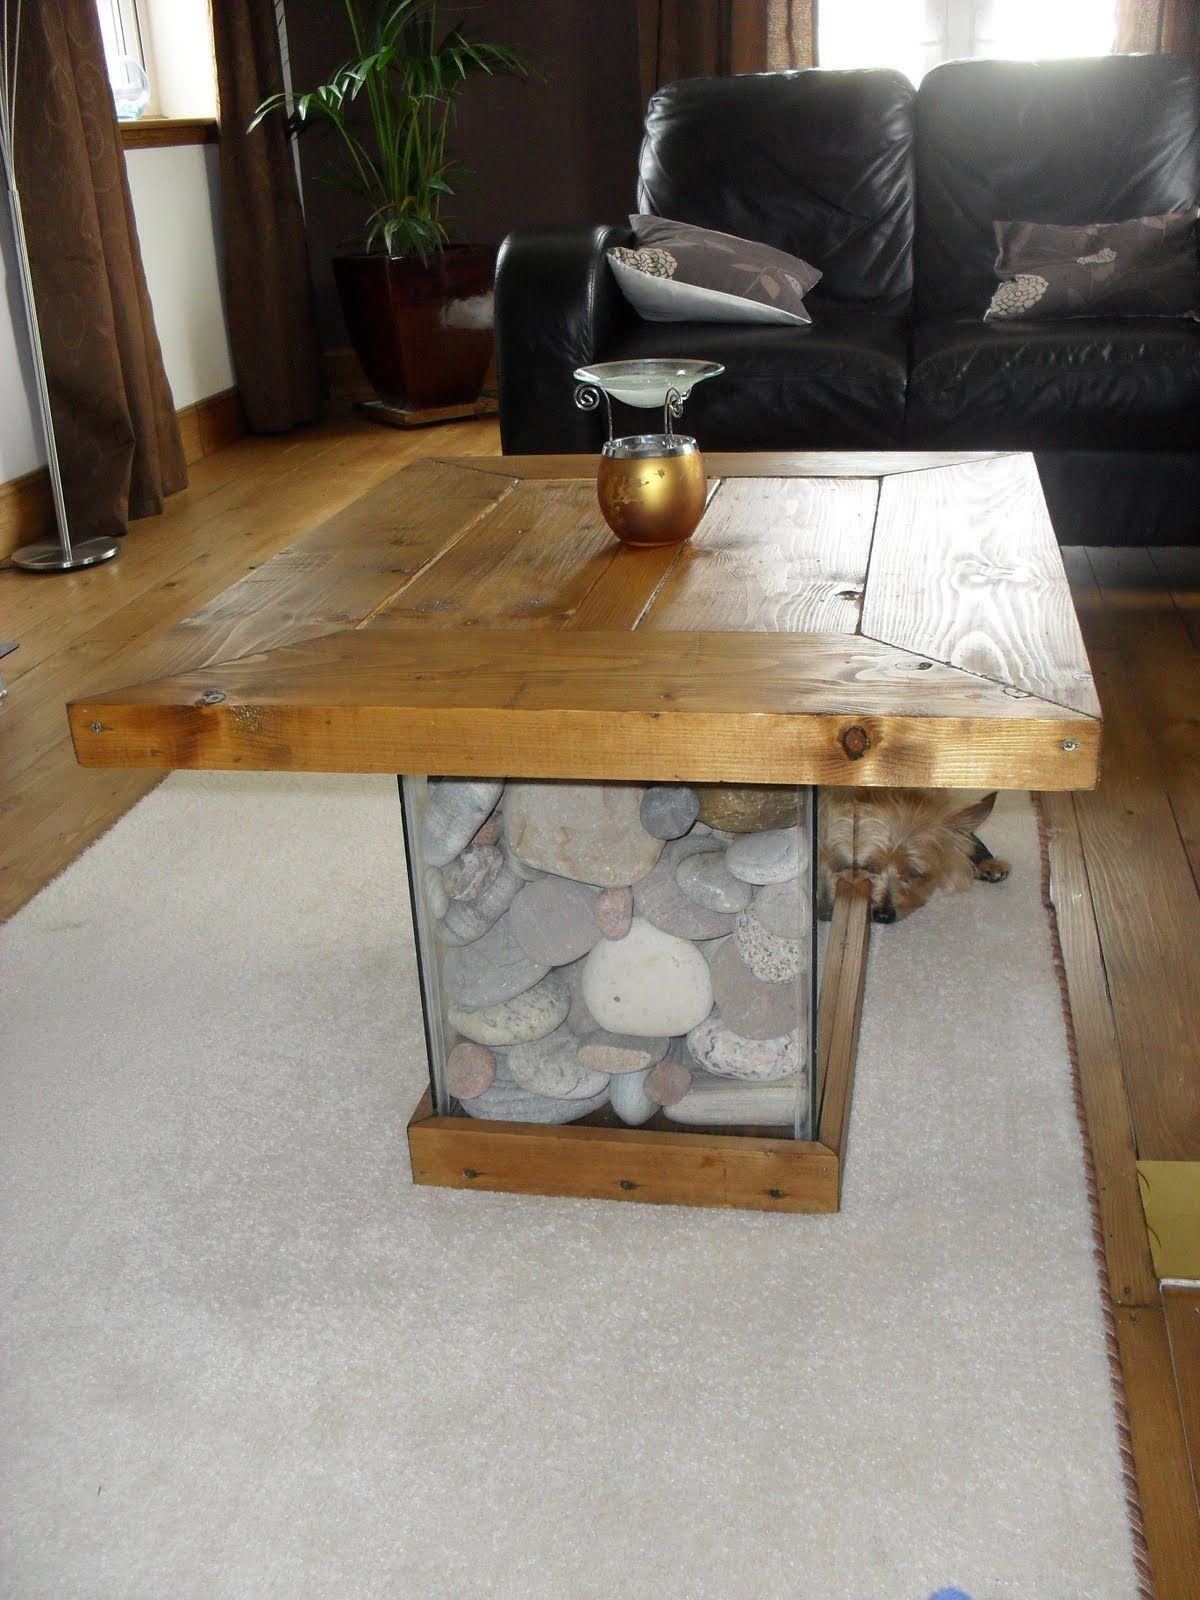 scrap wood,fish tank, pebble coffee table, handmade furniture